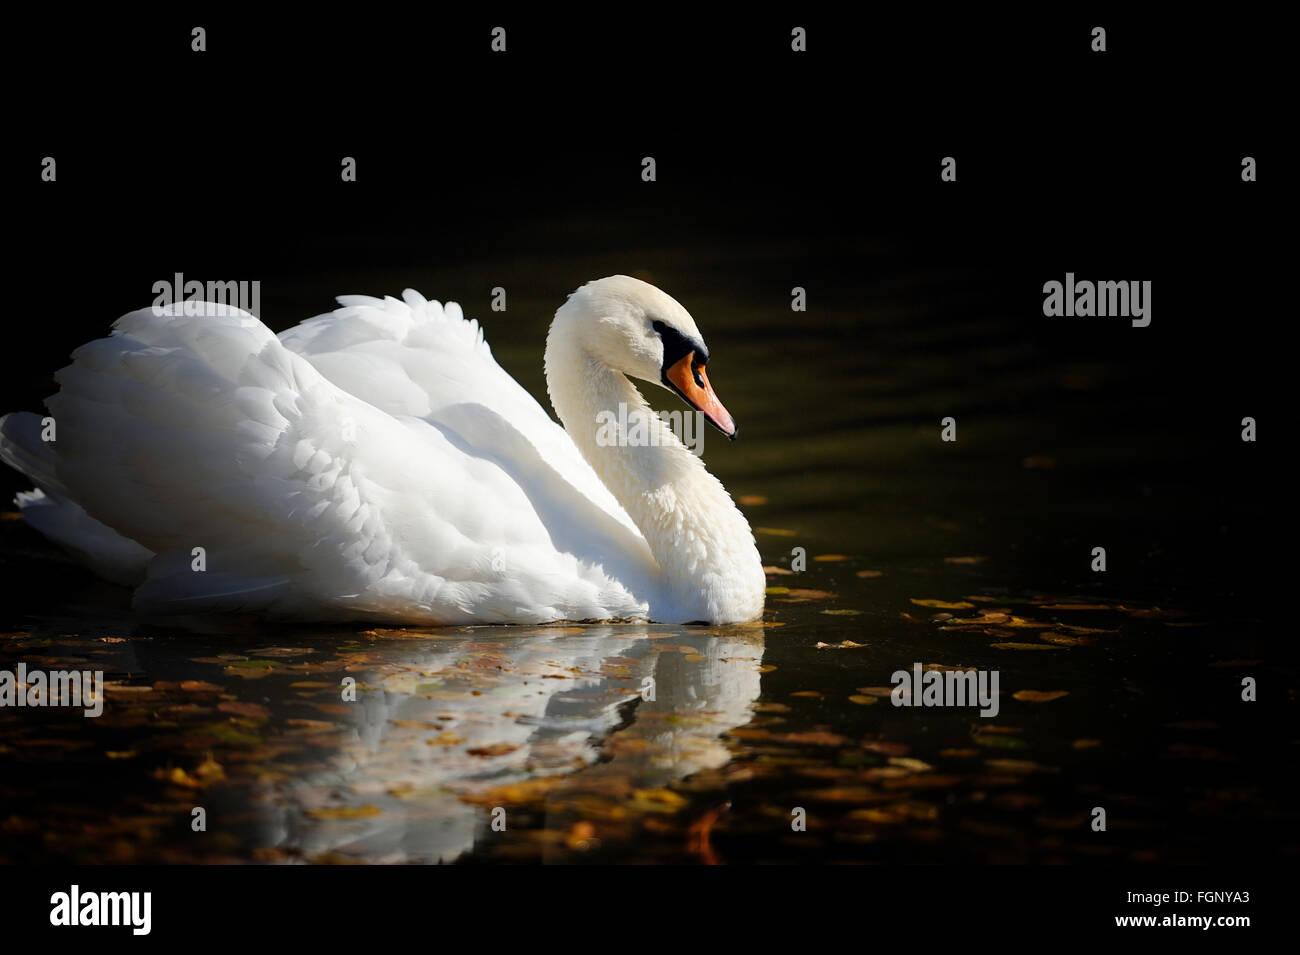 Swan swimming in the lake - Stock Image